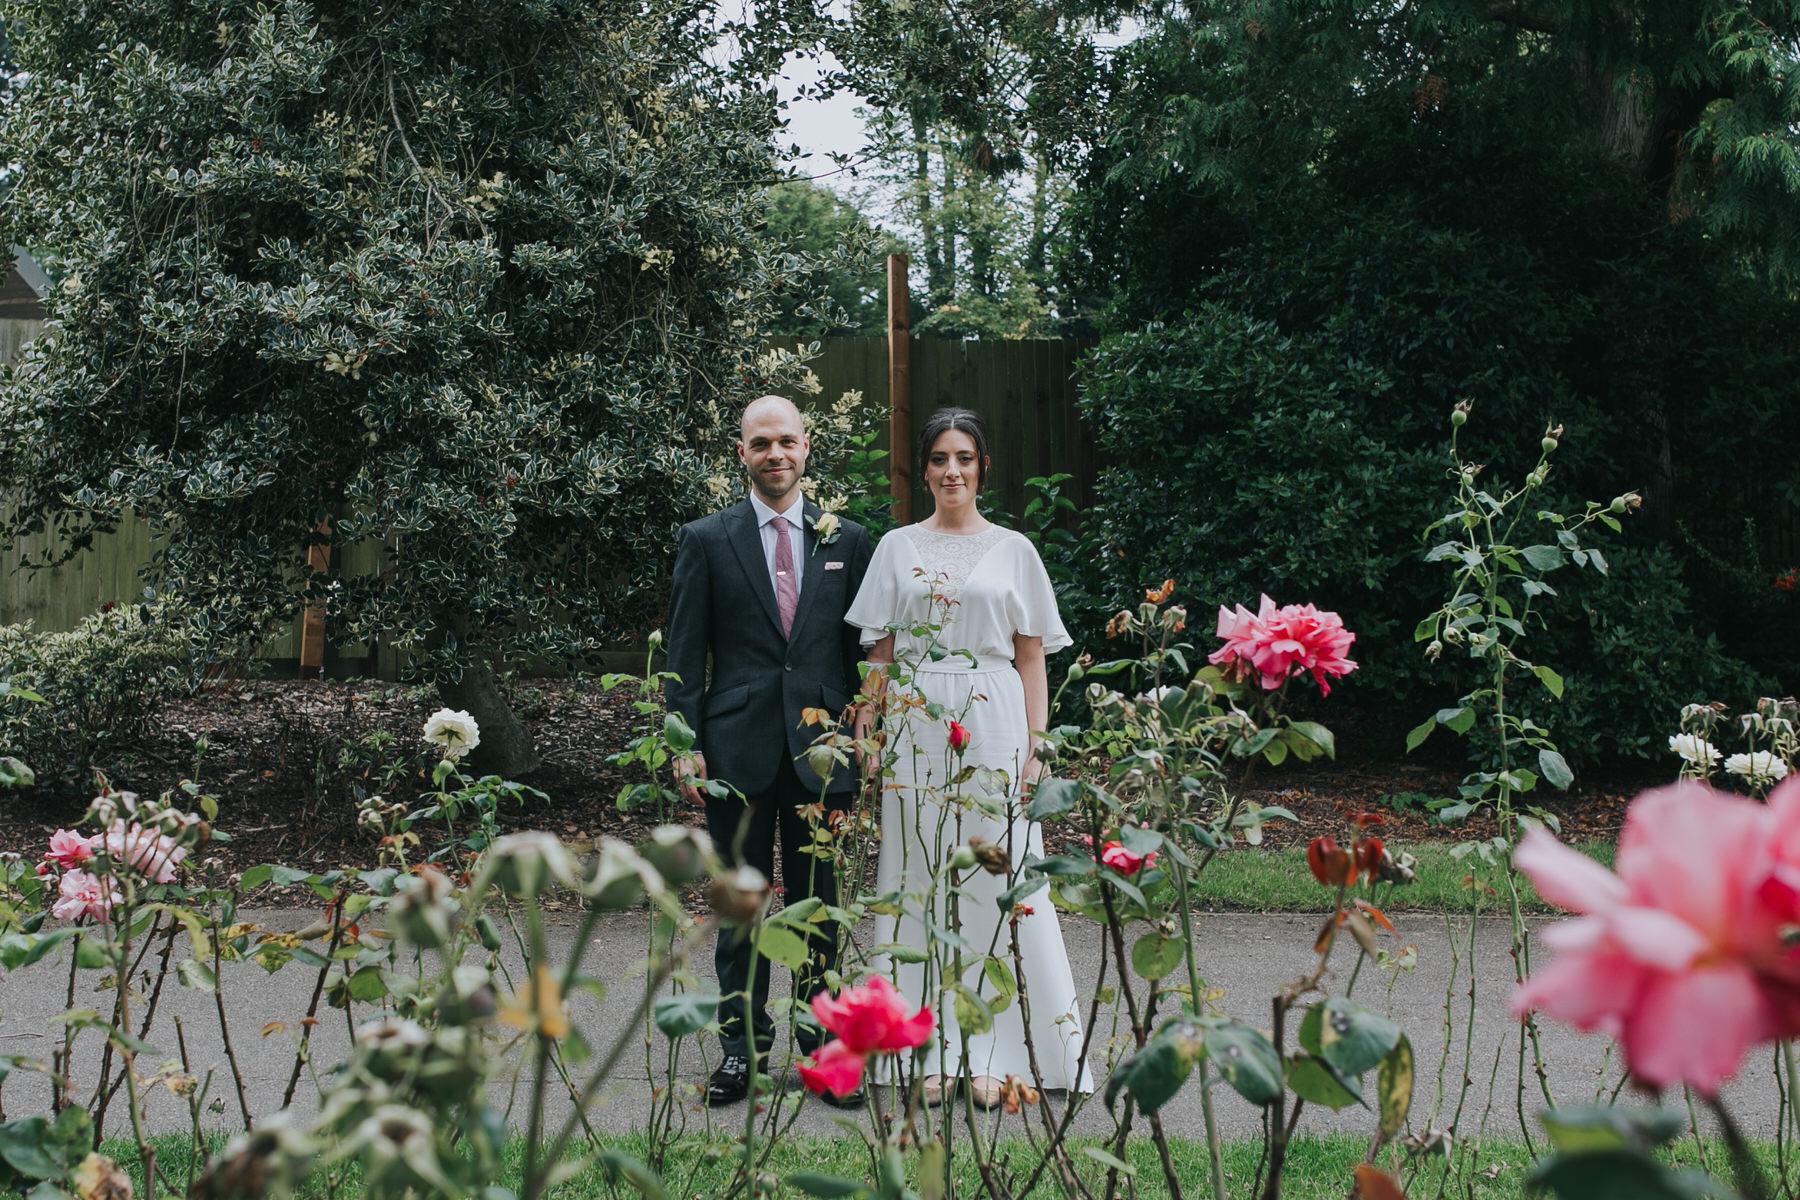 rose garden Belair park alternative bride groom portraits.jpg